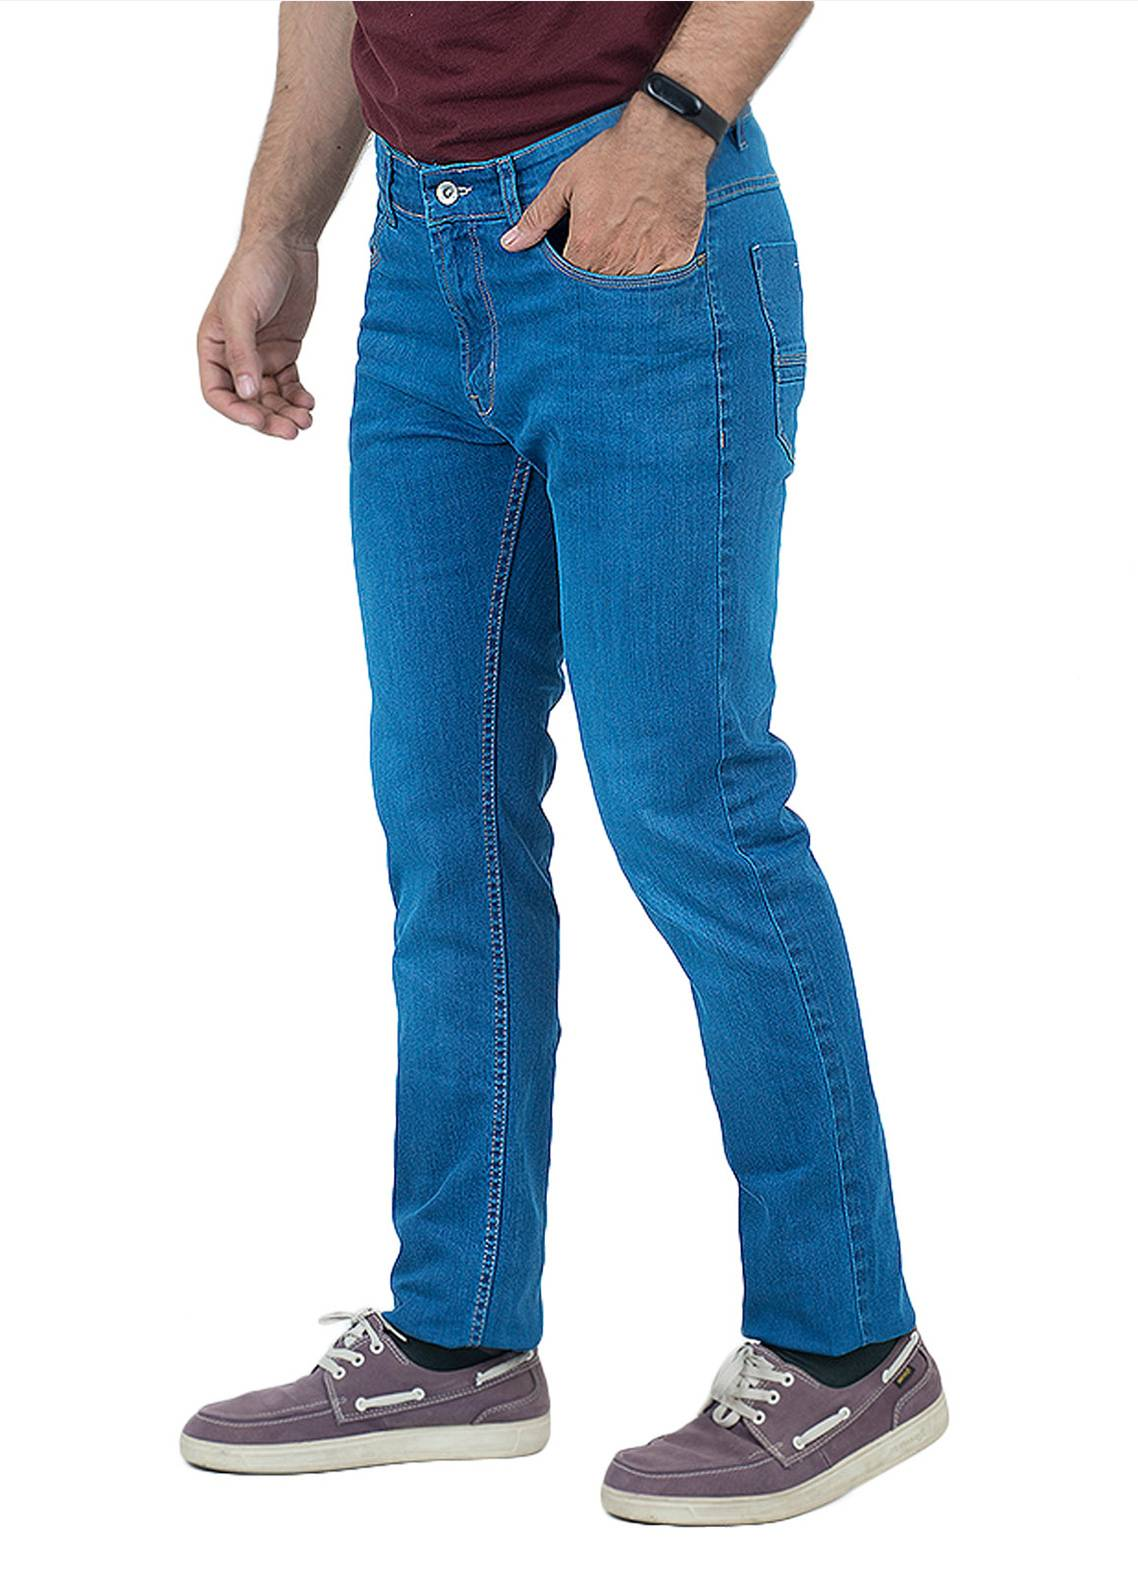 Shahzeb Saeed Denim Casual Jeans for Men - Royal Blue DNM-99